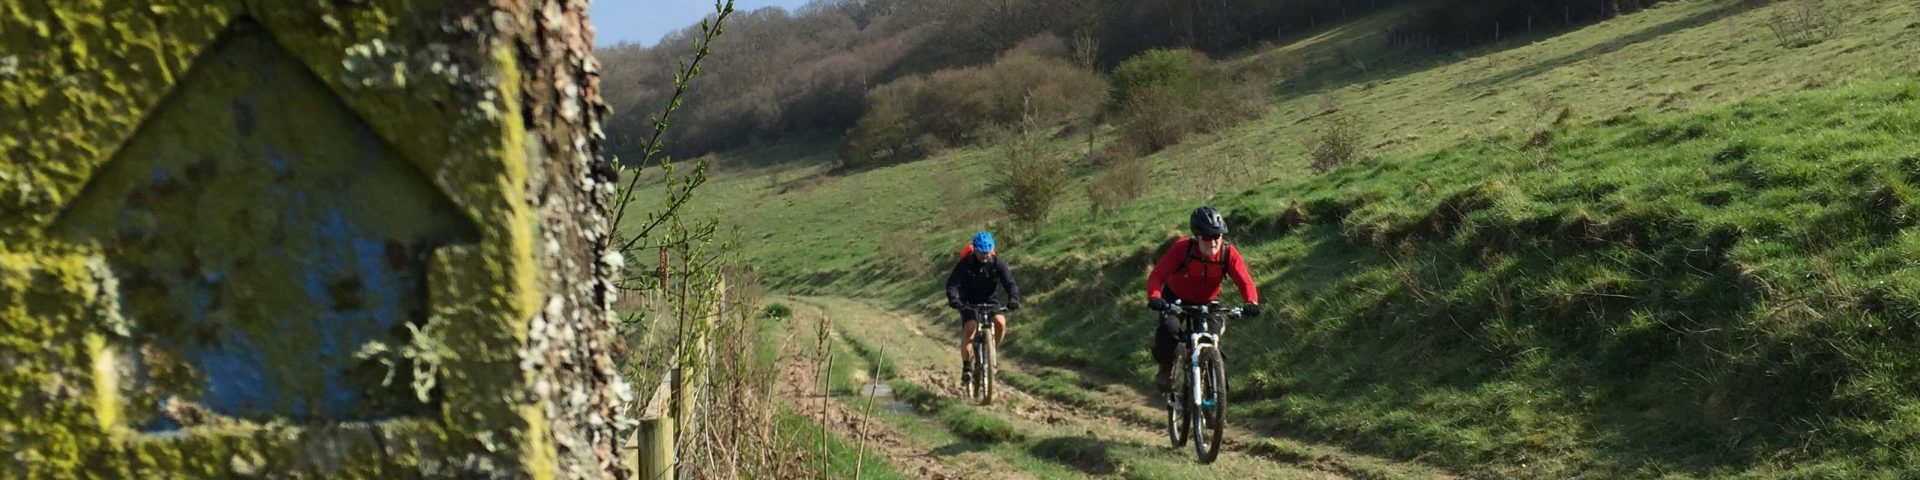 South Downs Mountain Biking